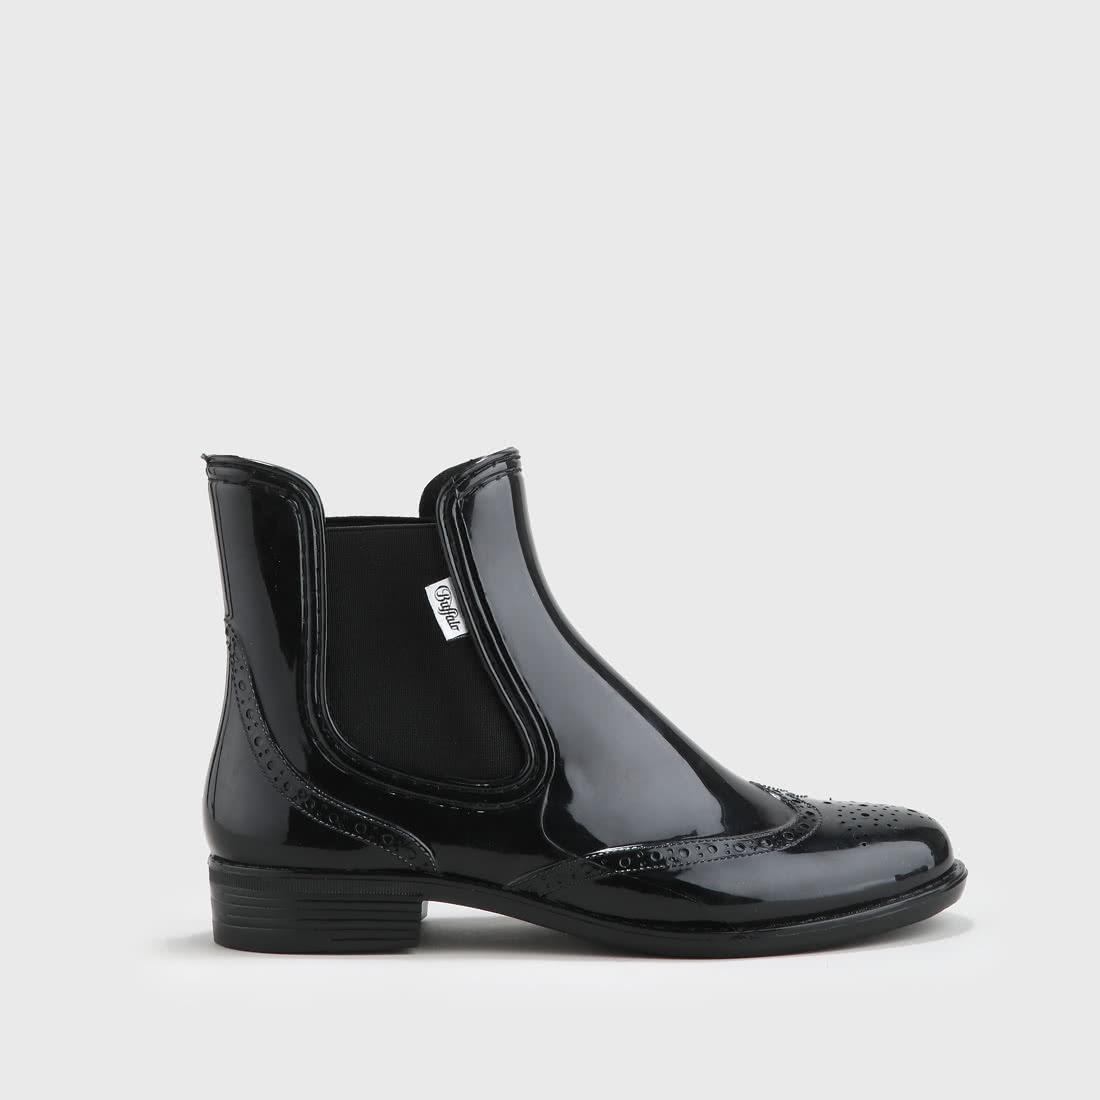 online store 5e6e9 e0fe0 Alisson Chelsea Boot Gummistiefel schwarz